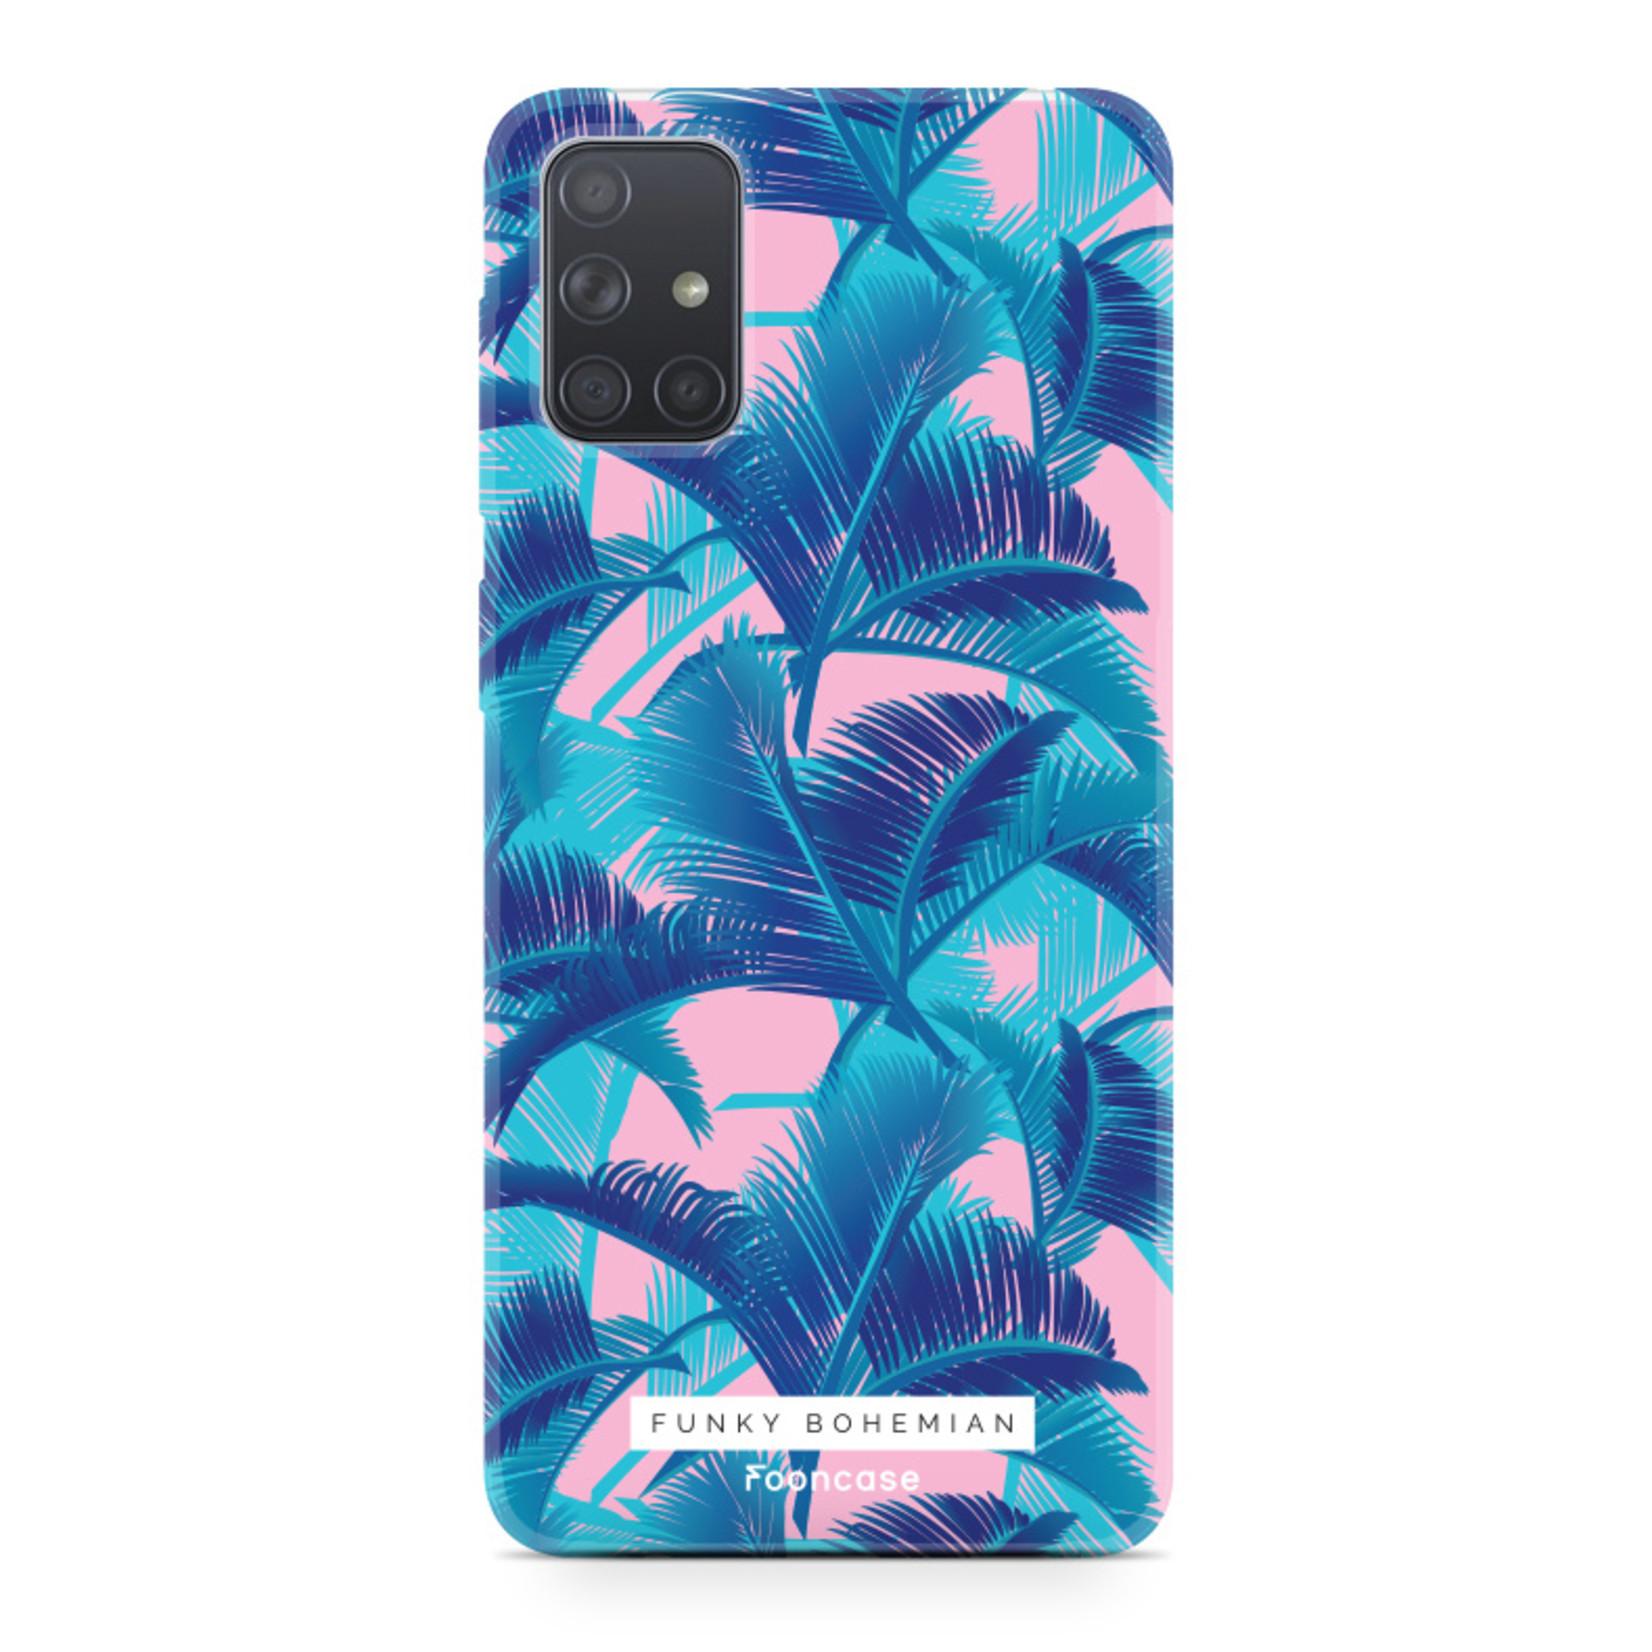 Samsung Galaxy A71 hoesje TPU Soft Case - Back Cover - Funky Bohemian / Blauw Roze Bladeren